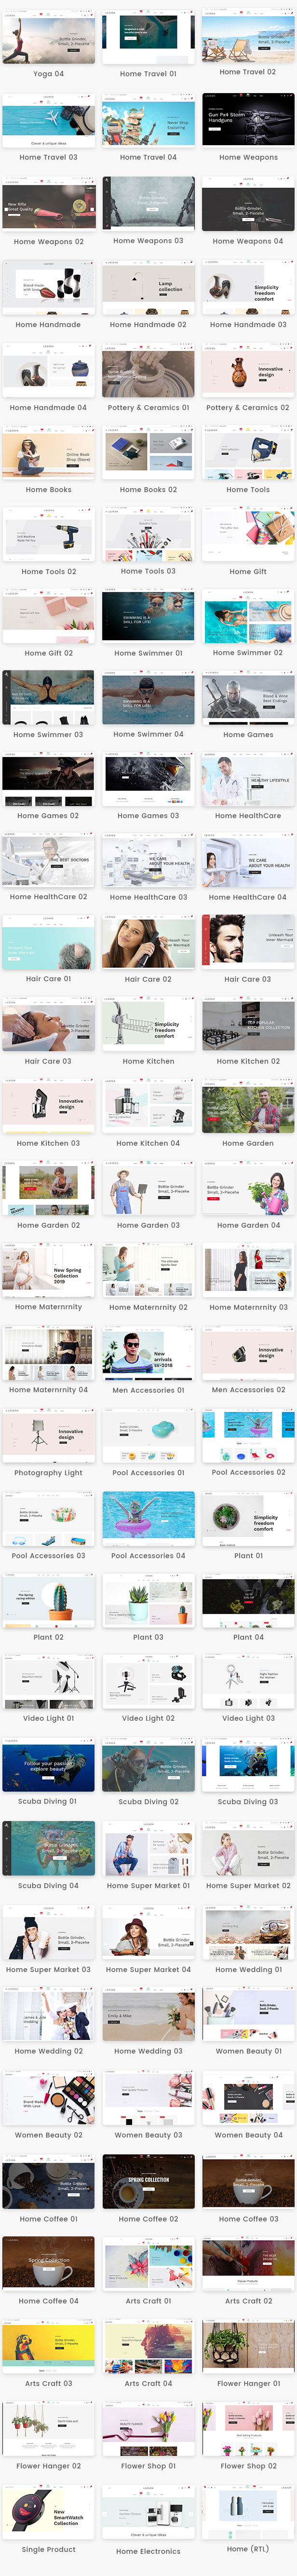 Lezada - Multipurpose Shopify Theme - 7